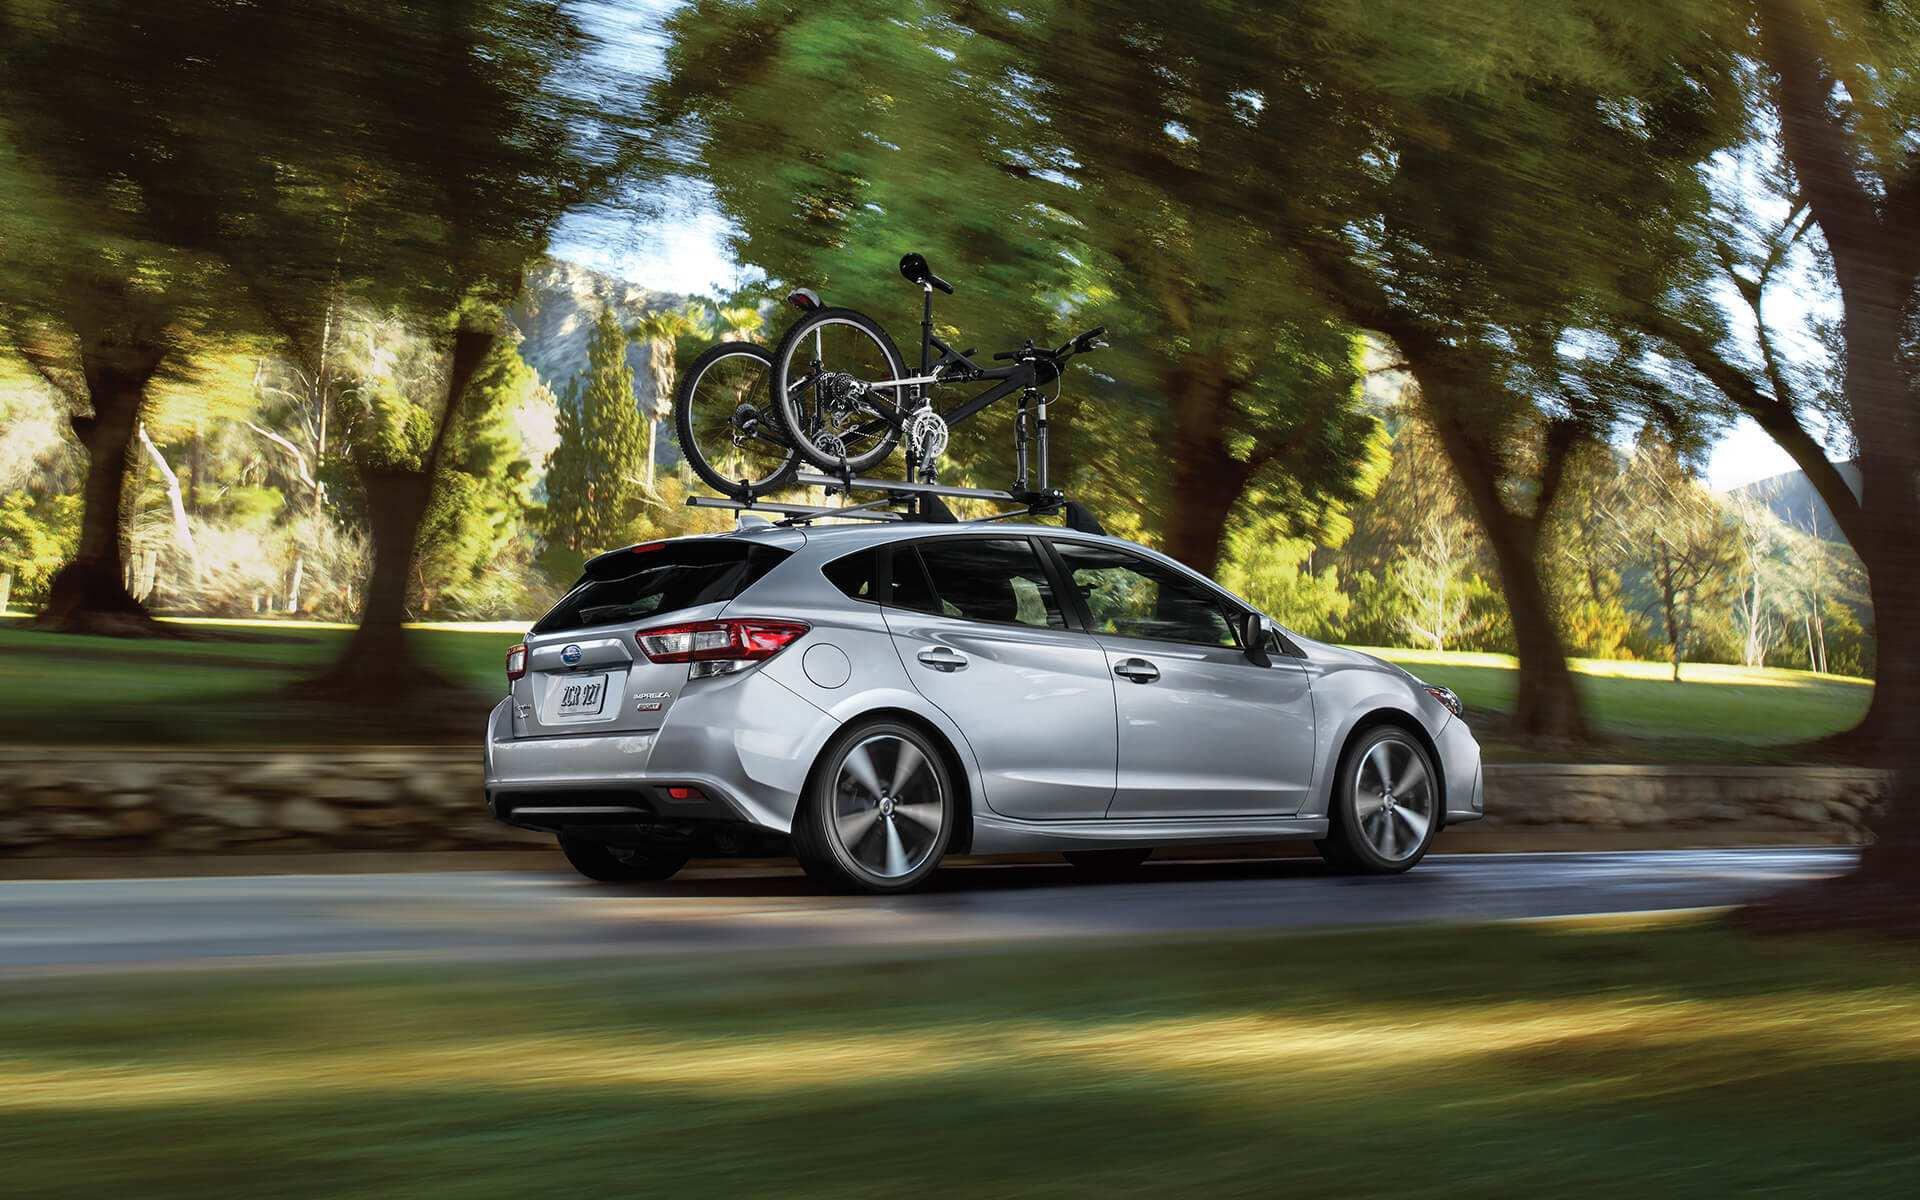 76 All New 2019 Subaru Hatchback Performance for 2019 Subaru Hatchback